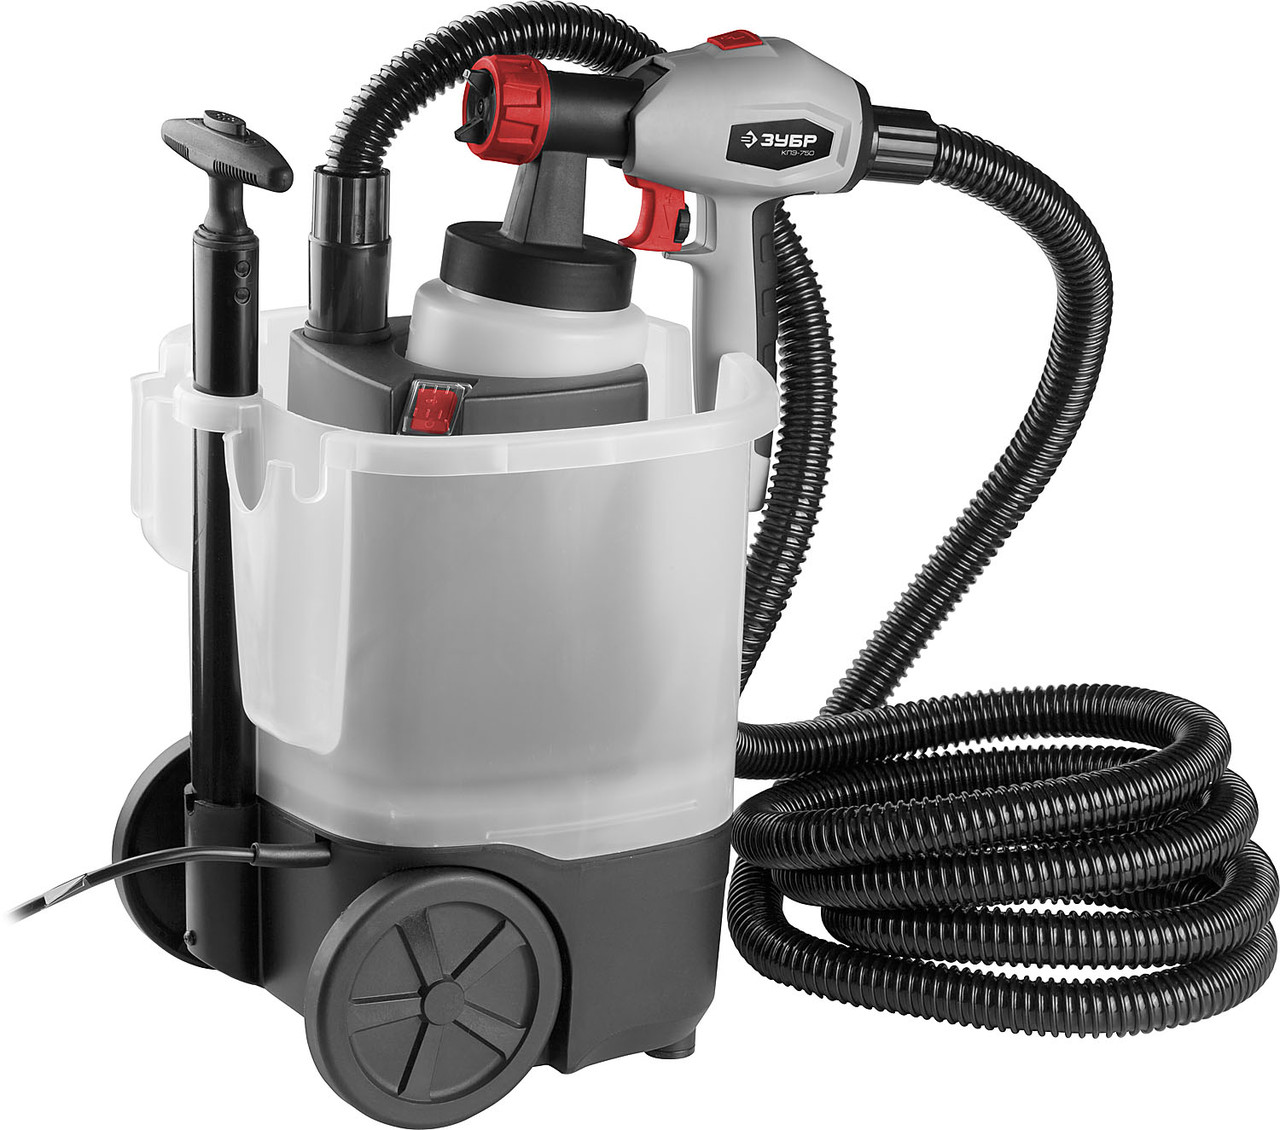 (КПЭ-750) Краскопульт (краскораспылитель) электрич, ЗУБР КПЭ-750, HVLP, 0.8л, краскоперенос 0-800мл/мин